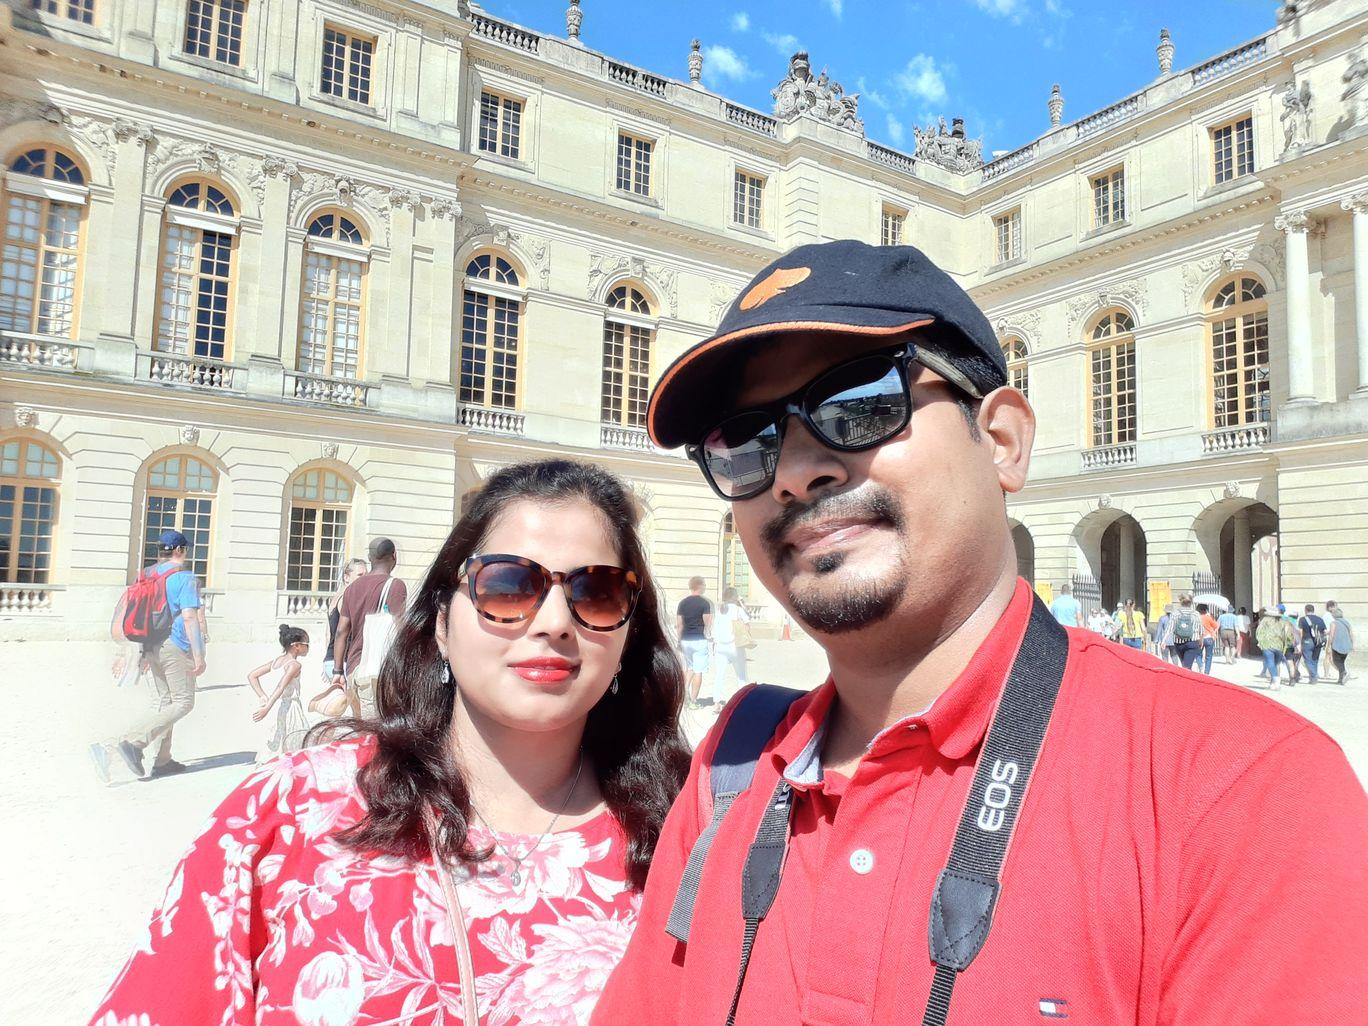 Photo of Versailles palace By Supratim Banerjee